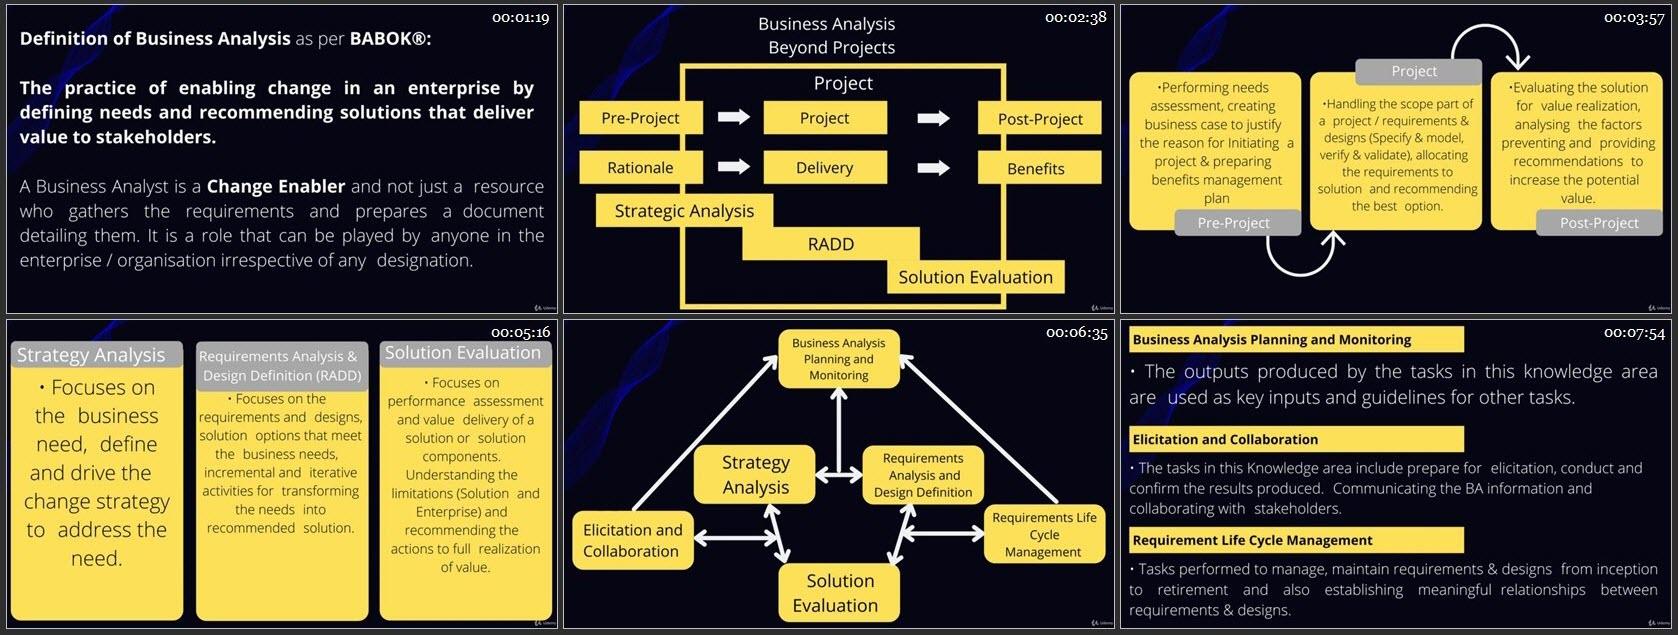 CBAP - IIBA Certified Business Analysis Professional Course